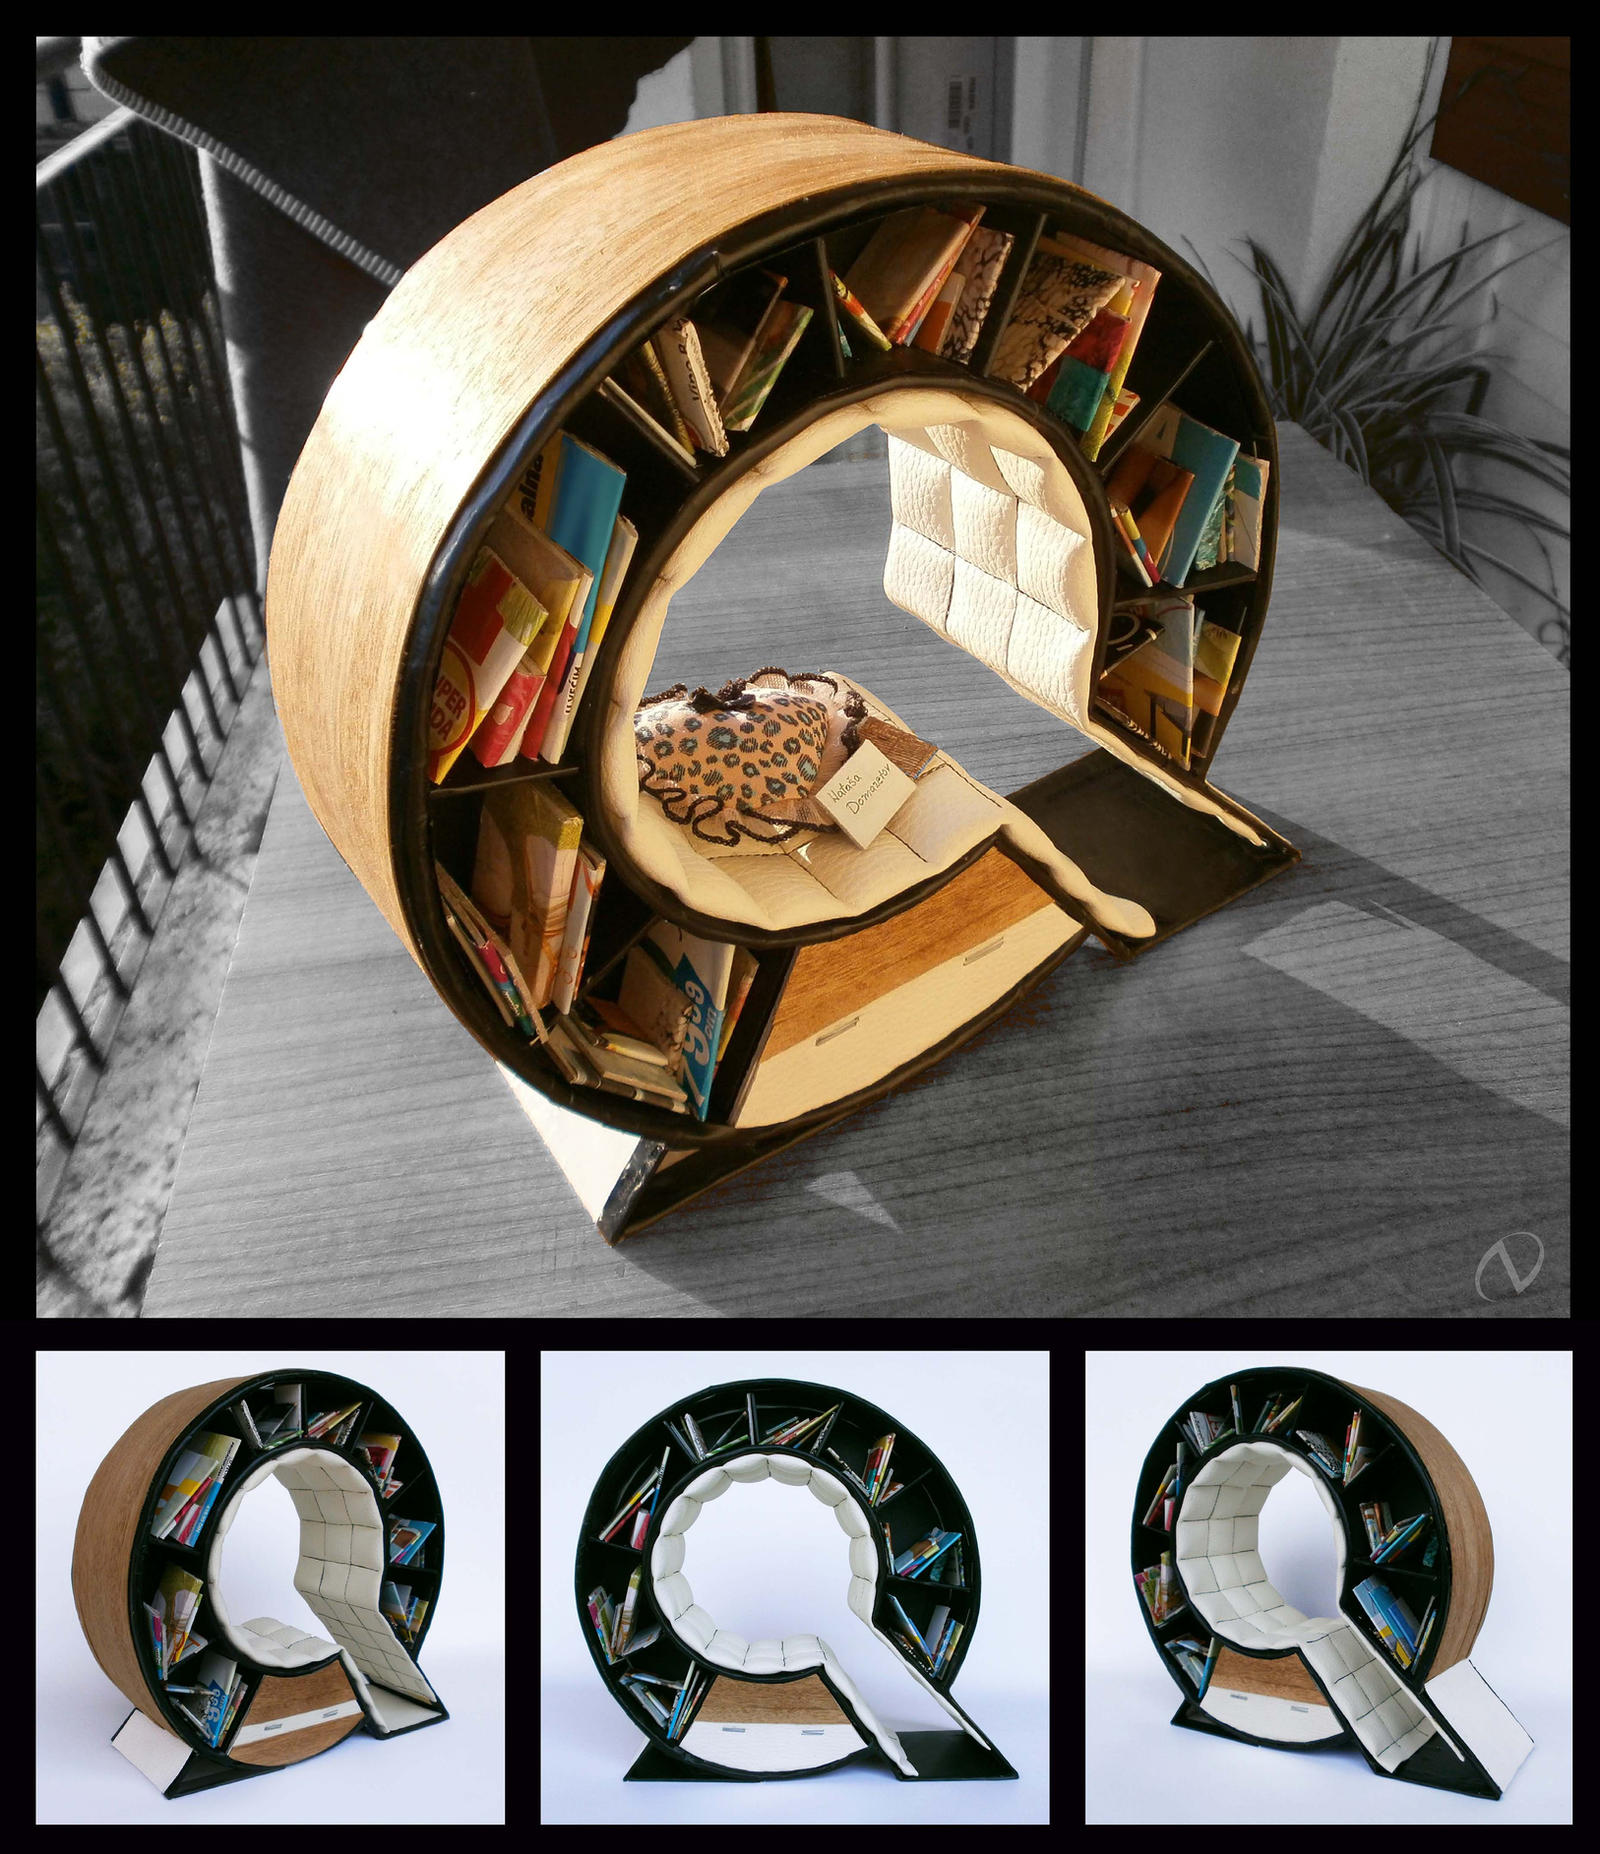 Q - Bookshelf Chair by NatasaTW Q - Bookshelf Chair by NatasaTW